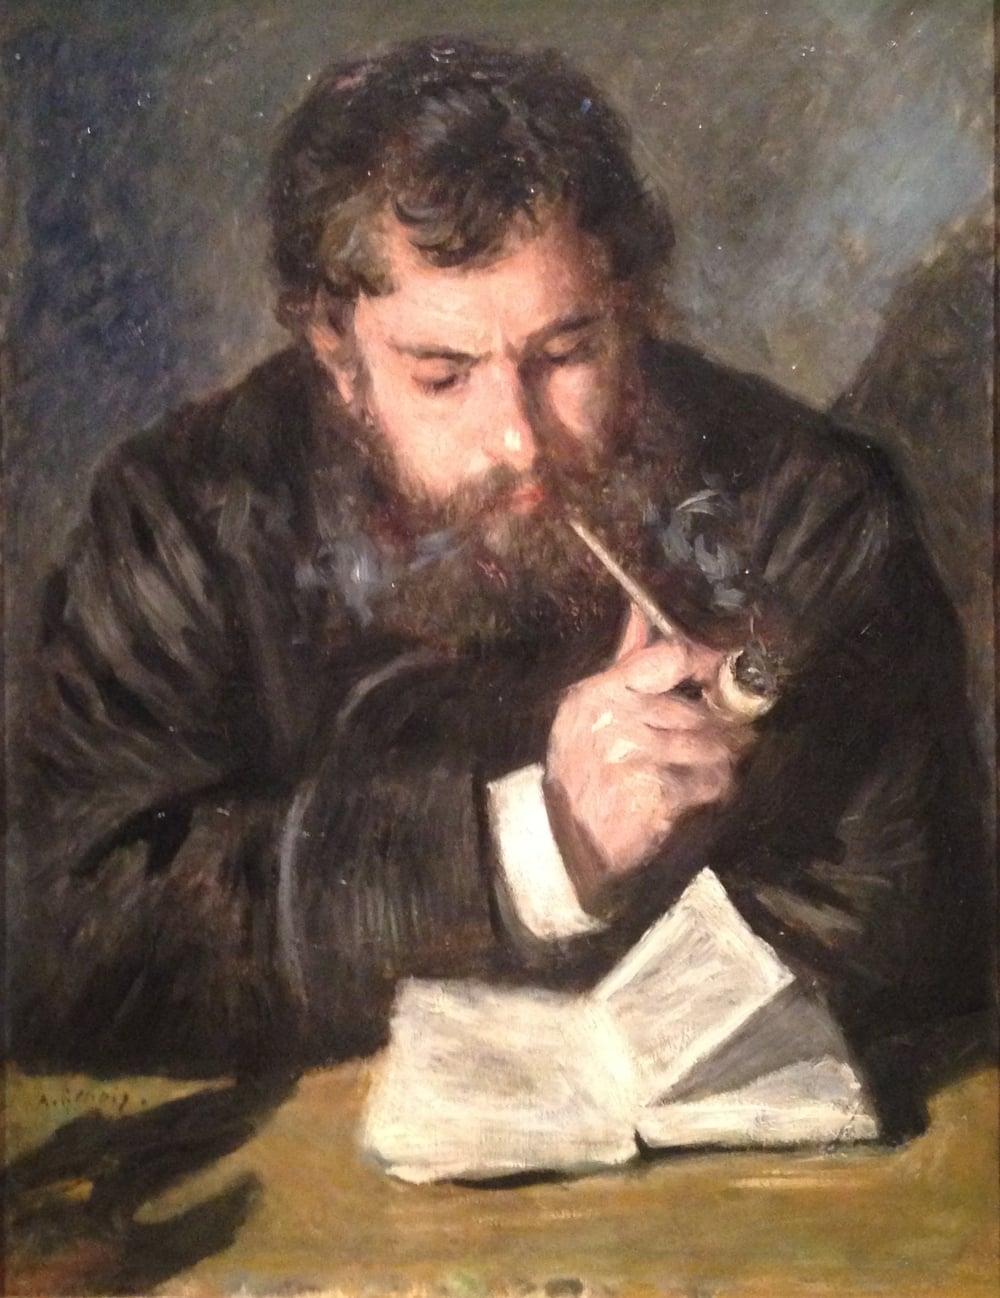 Claude Monet as painted by August Renoir in 1872.